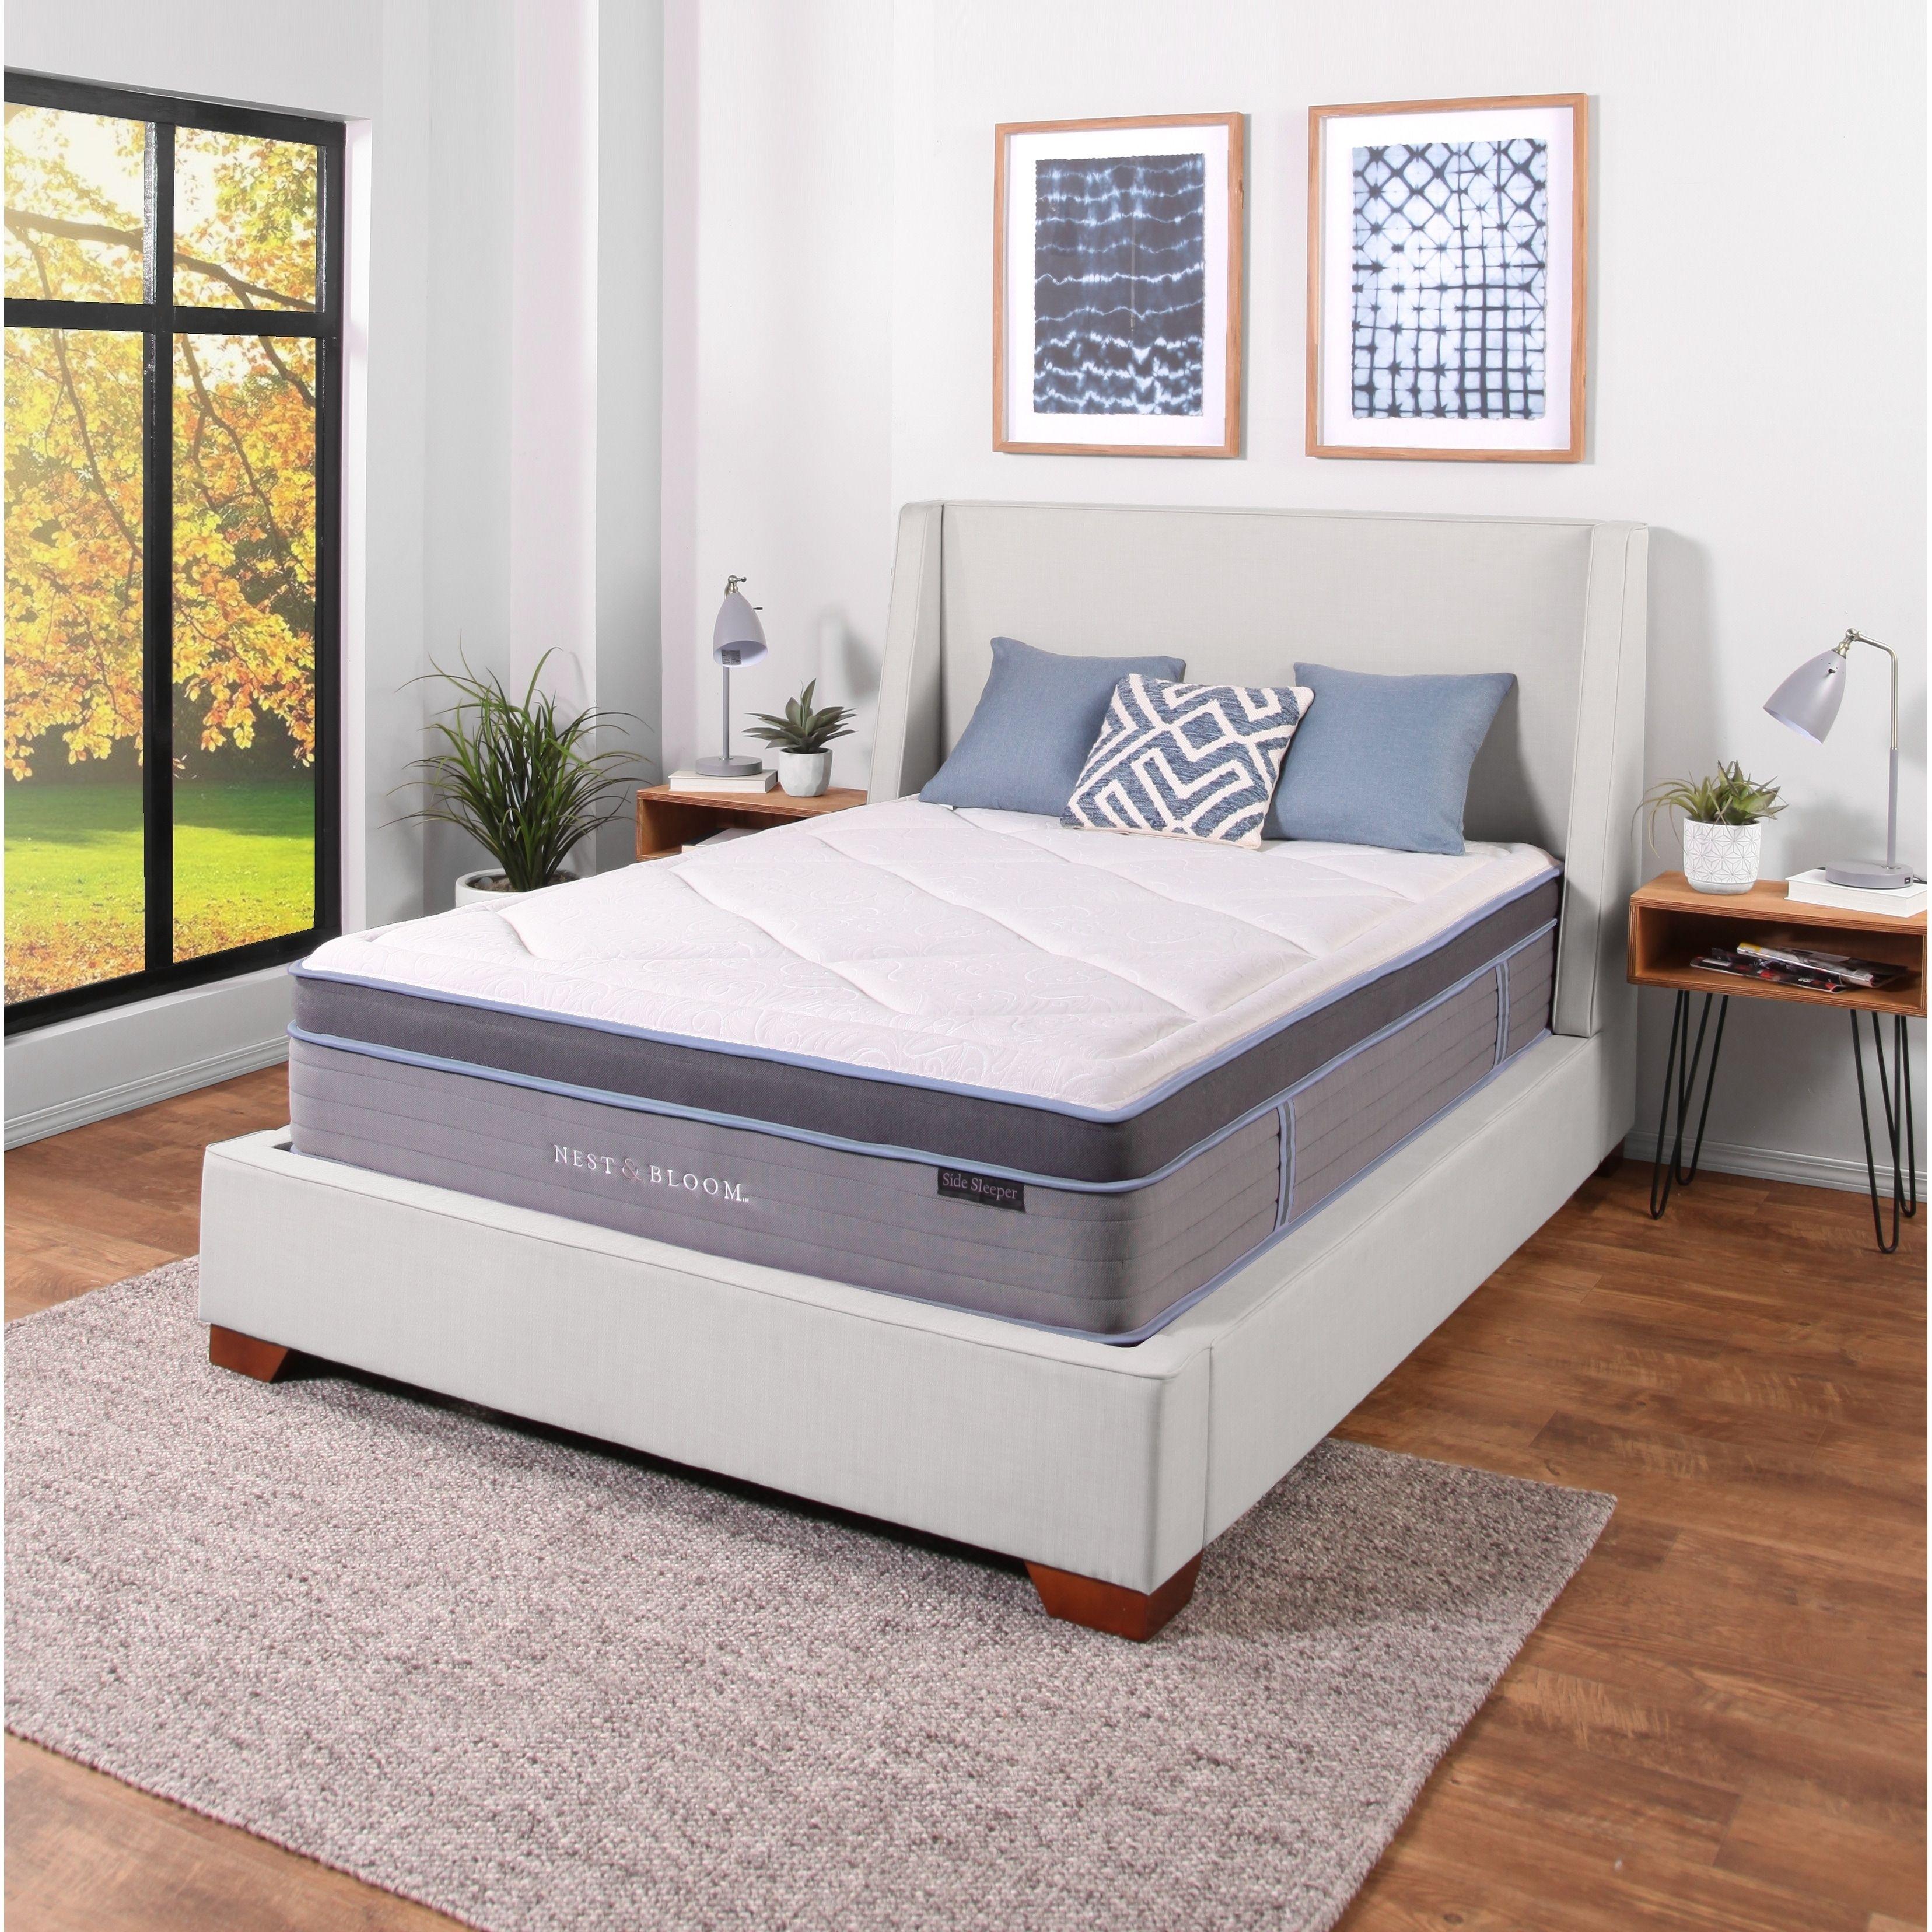 Nest Bloom 13 Side Sleeper Hybrid Tufted Mattress Bedroom Furniture Stores Mattress Sets Mattress Dimensions